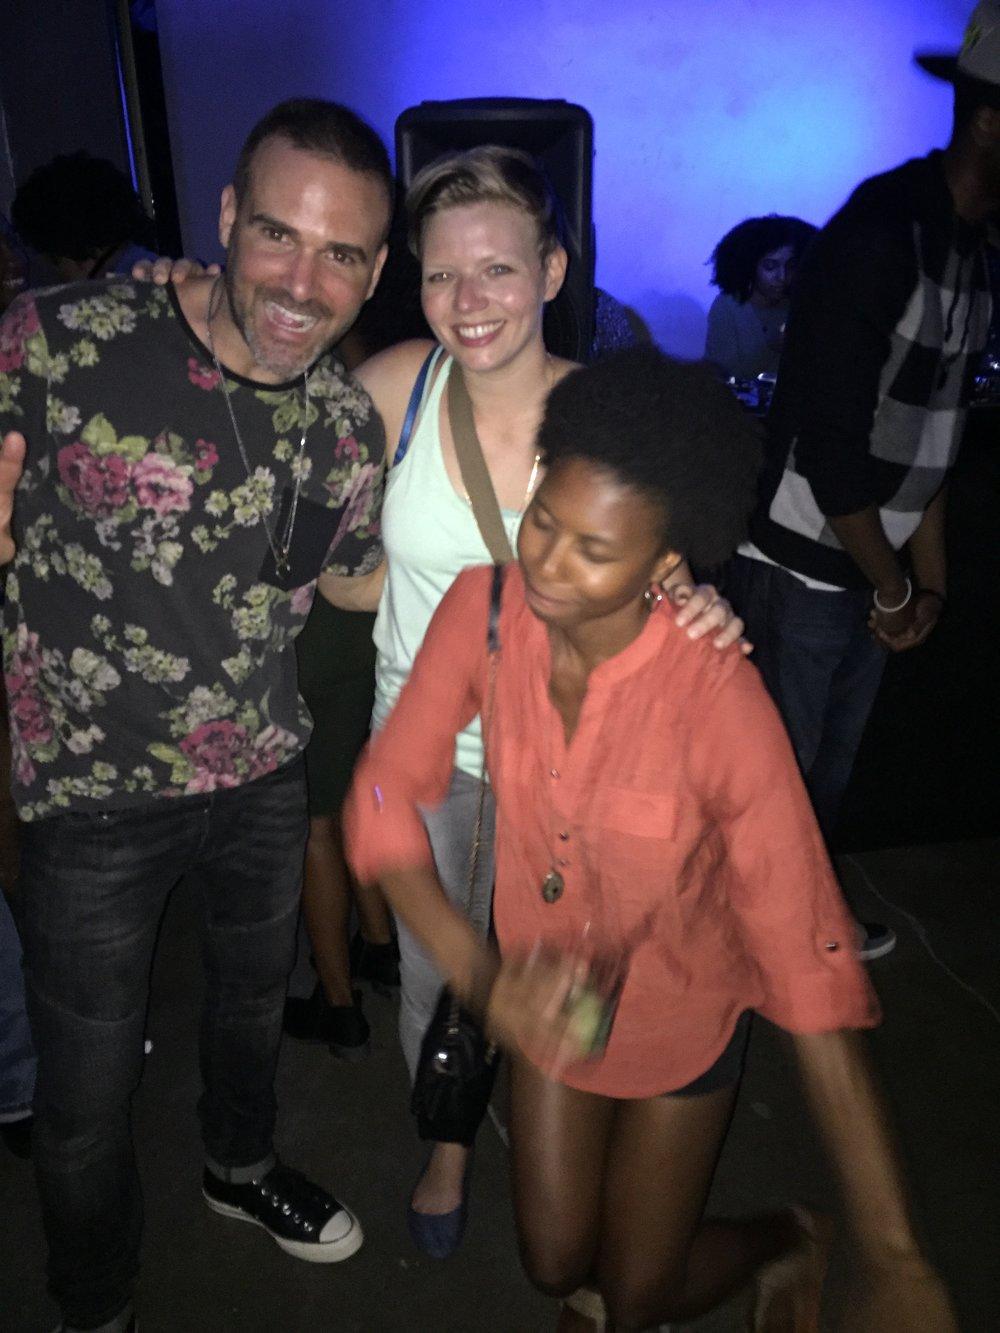 White People Do Black Things_Episode_03_Blavity_1.jpg